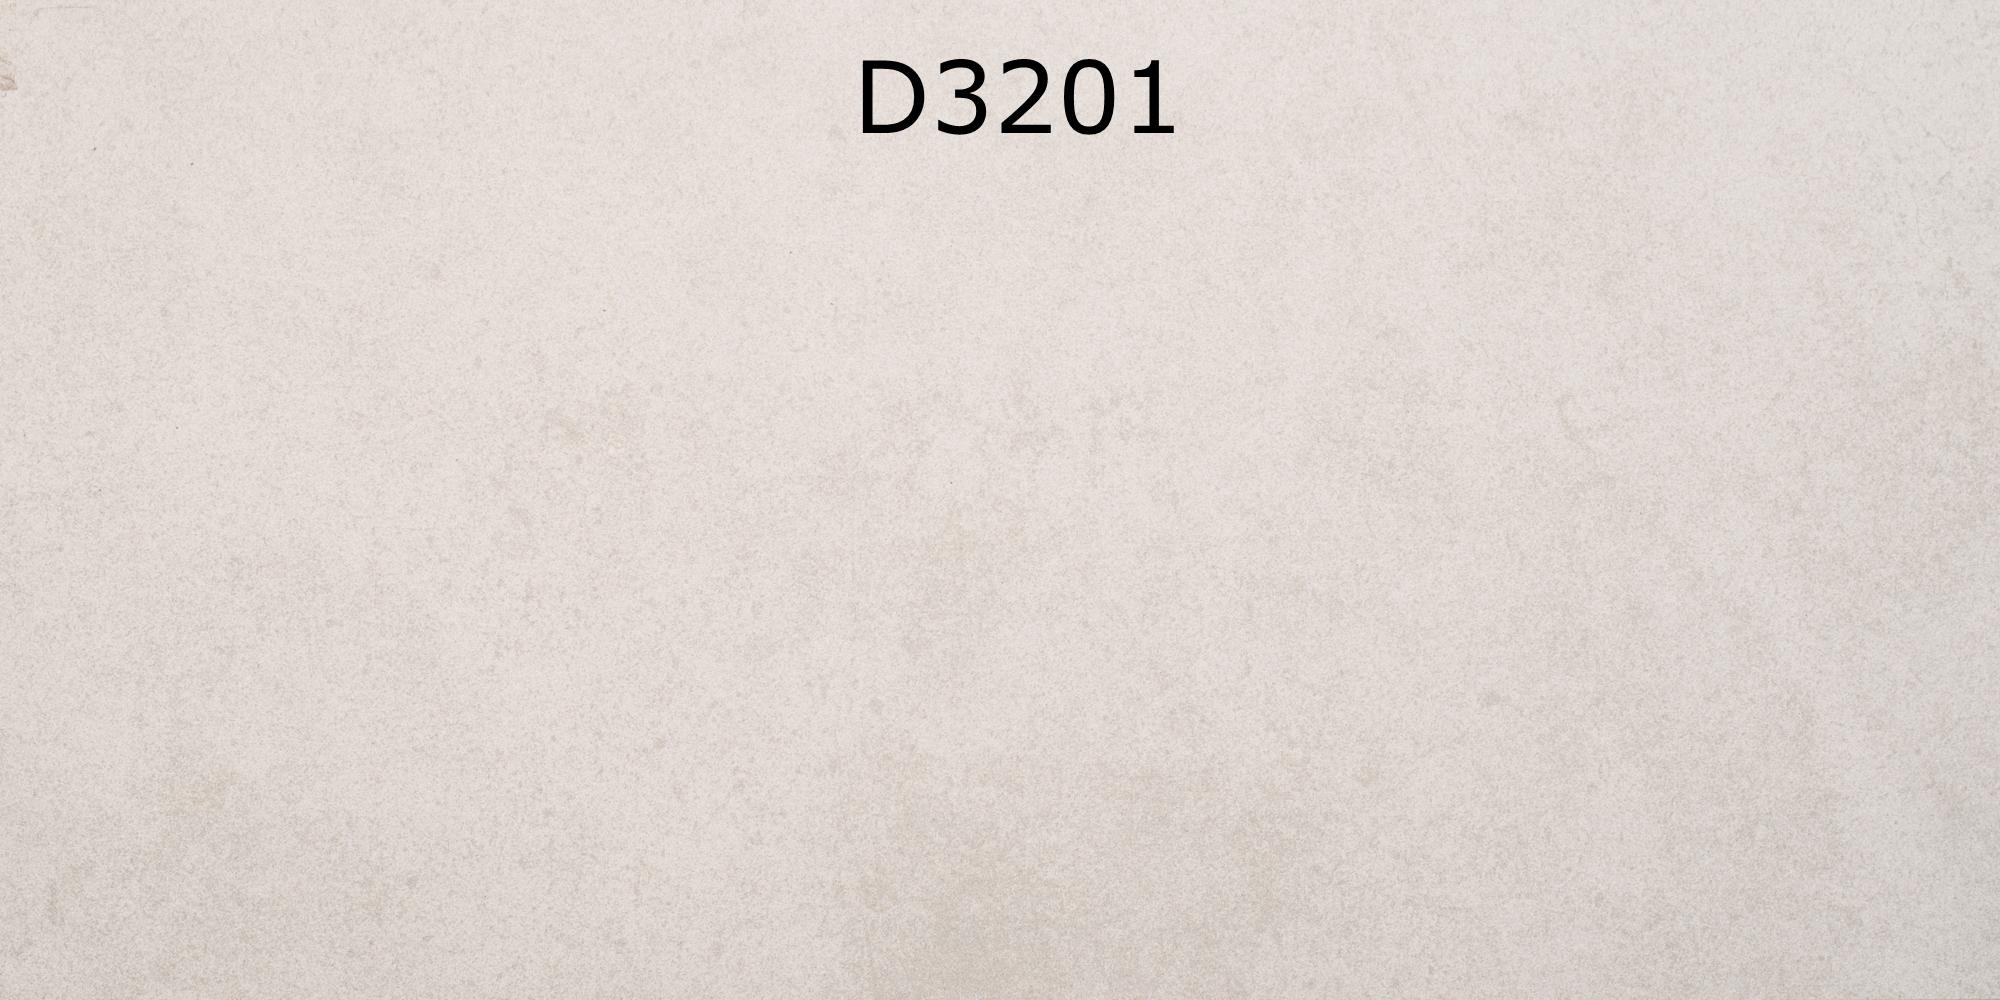 D3201